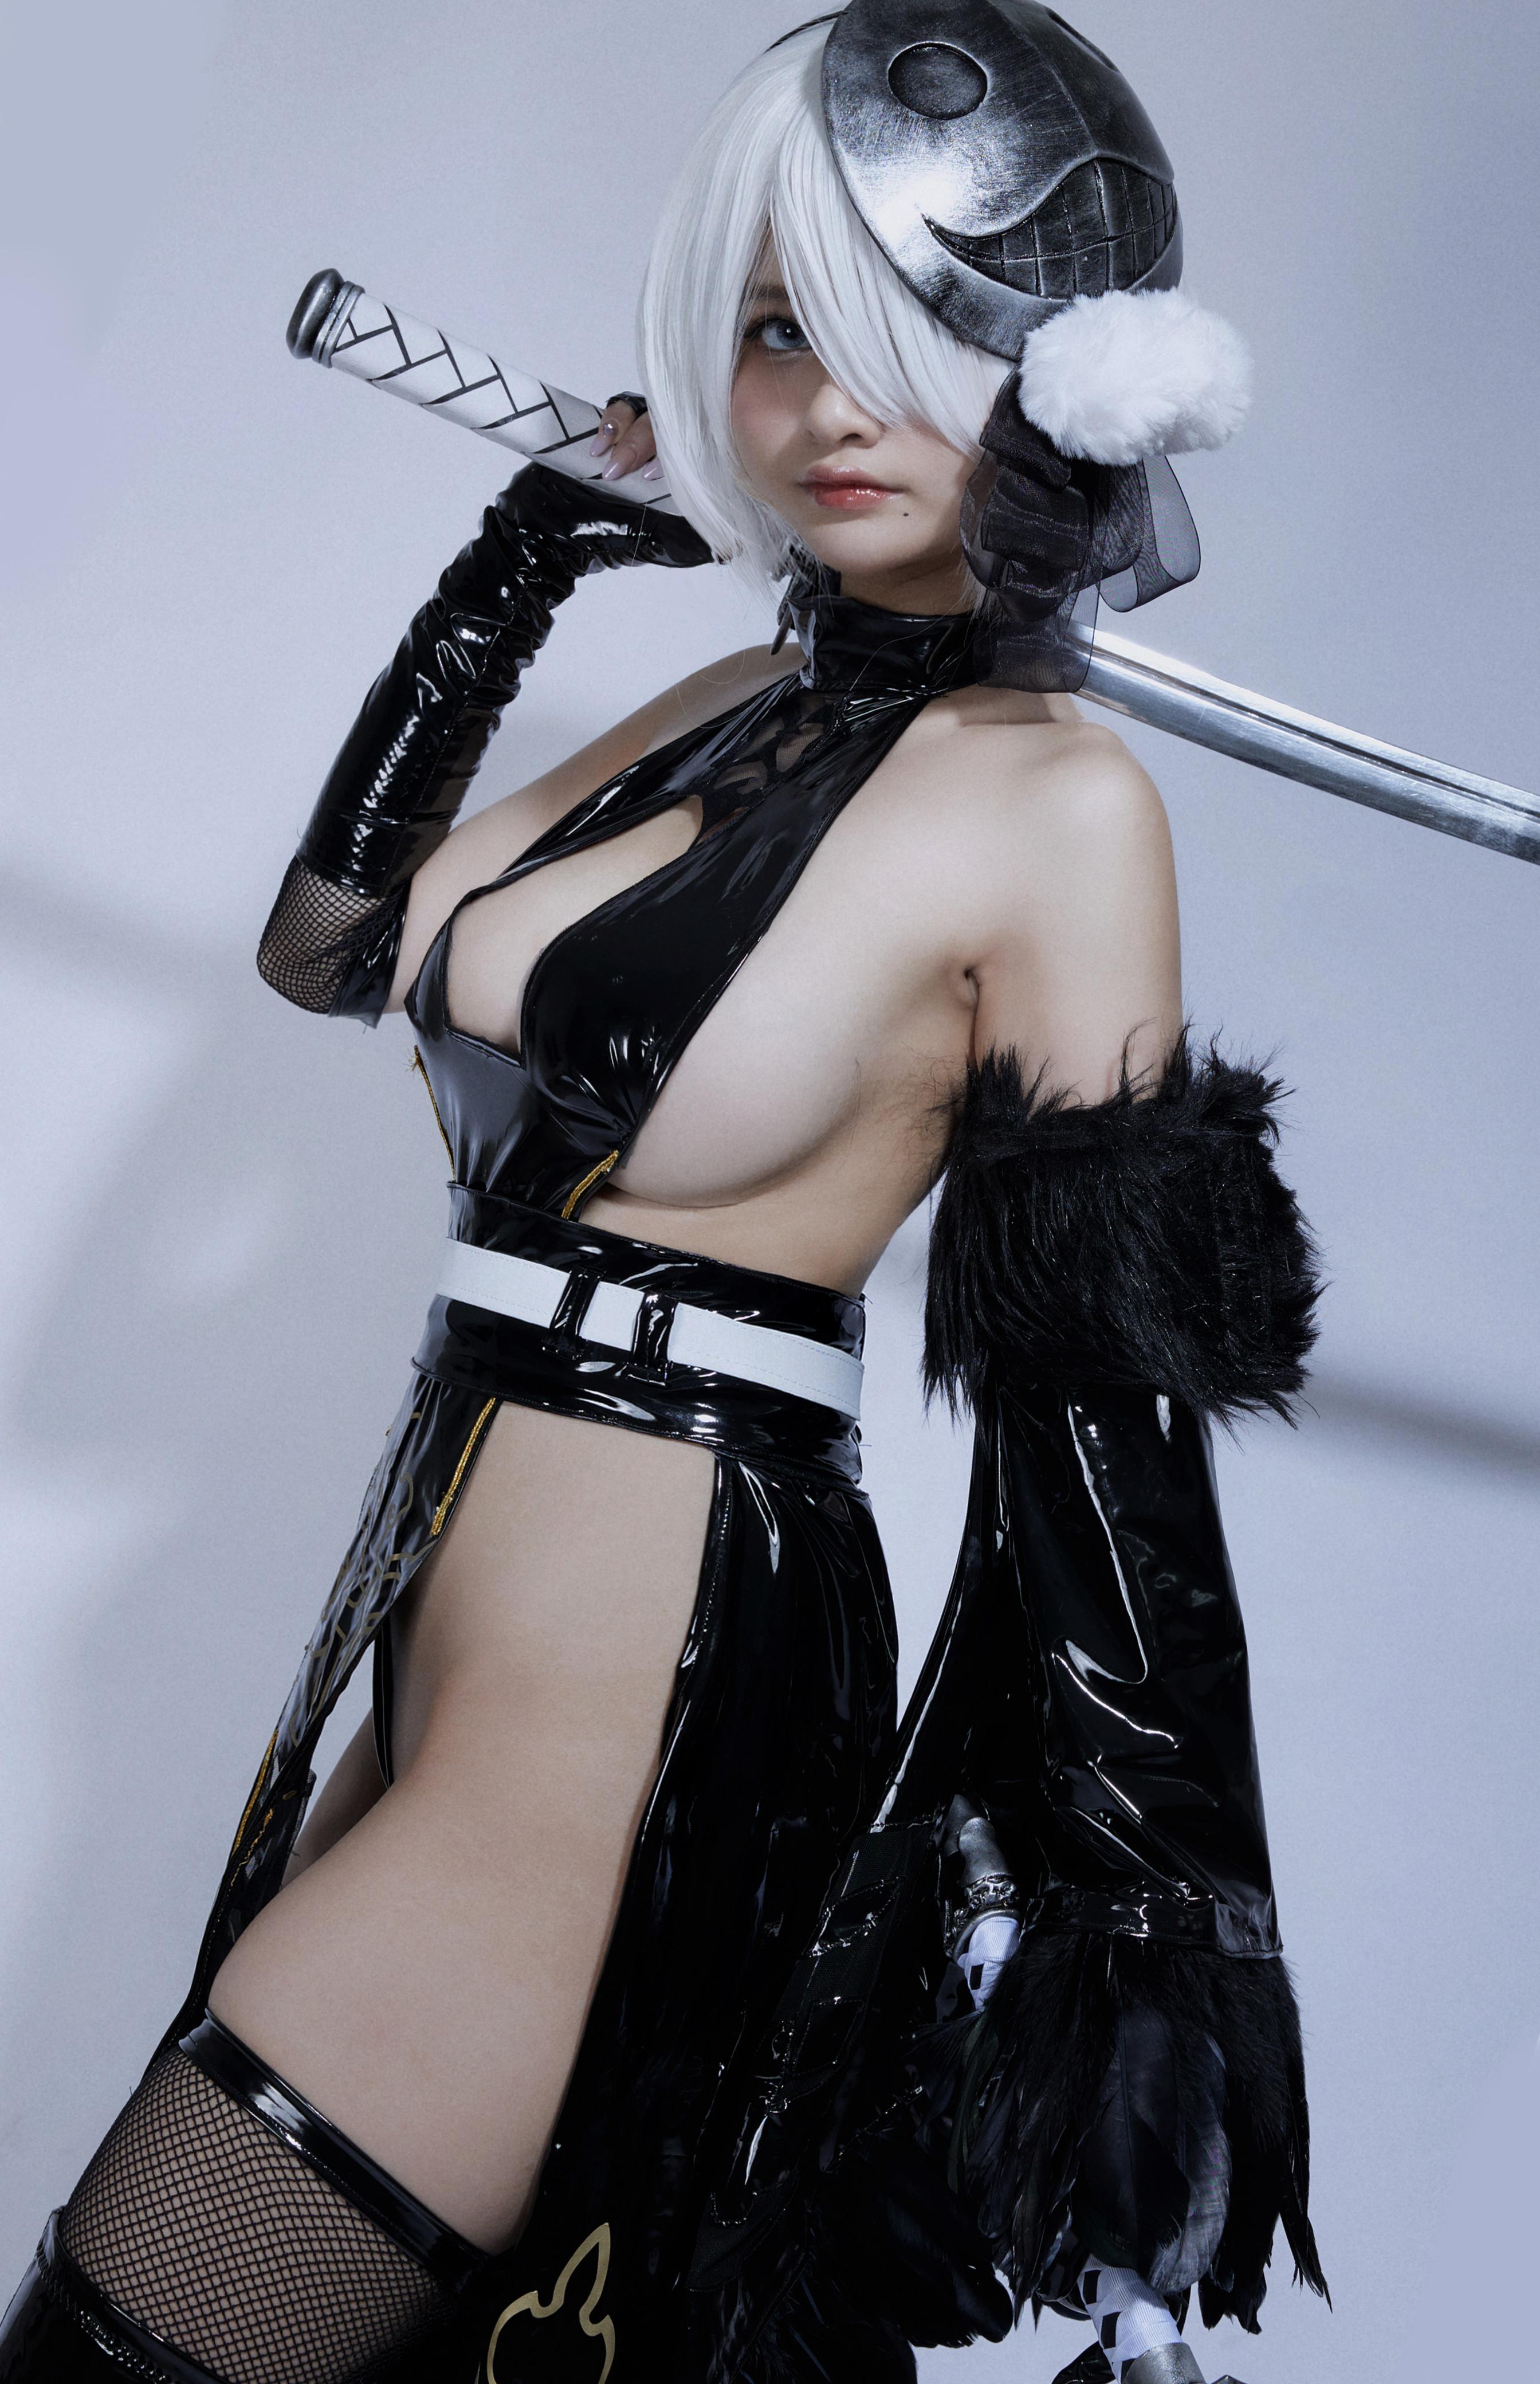 Azami - 2B Shinobi - Nier Automata Cosplay 04